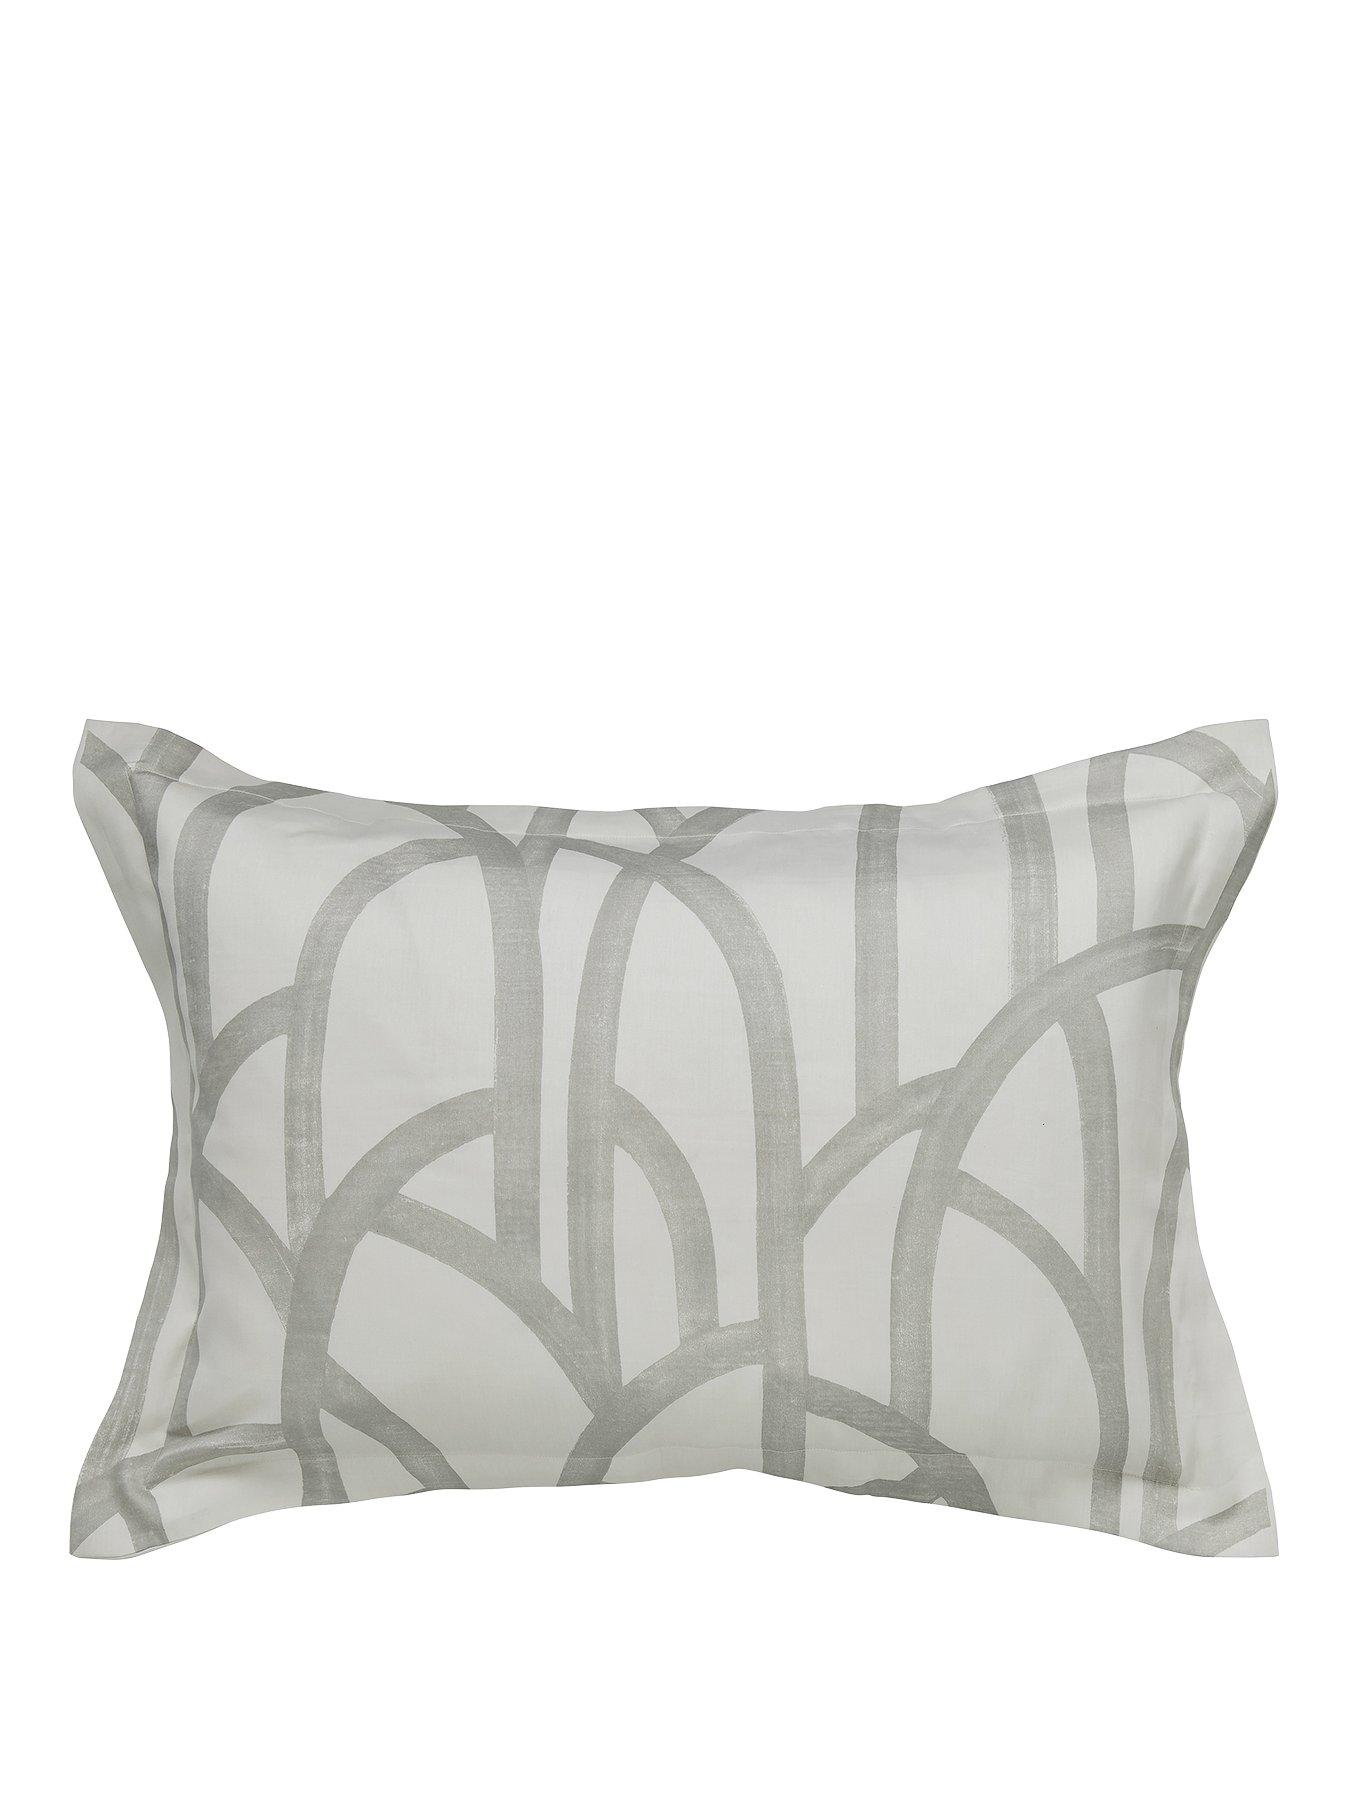 Harlequin Harlequin Meso 100% Cotton Oxford Pillowcase